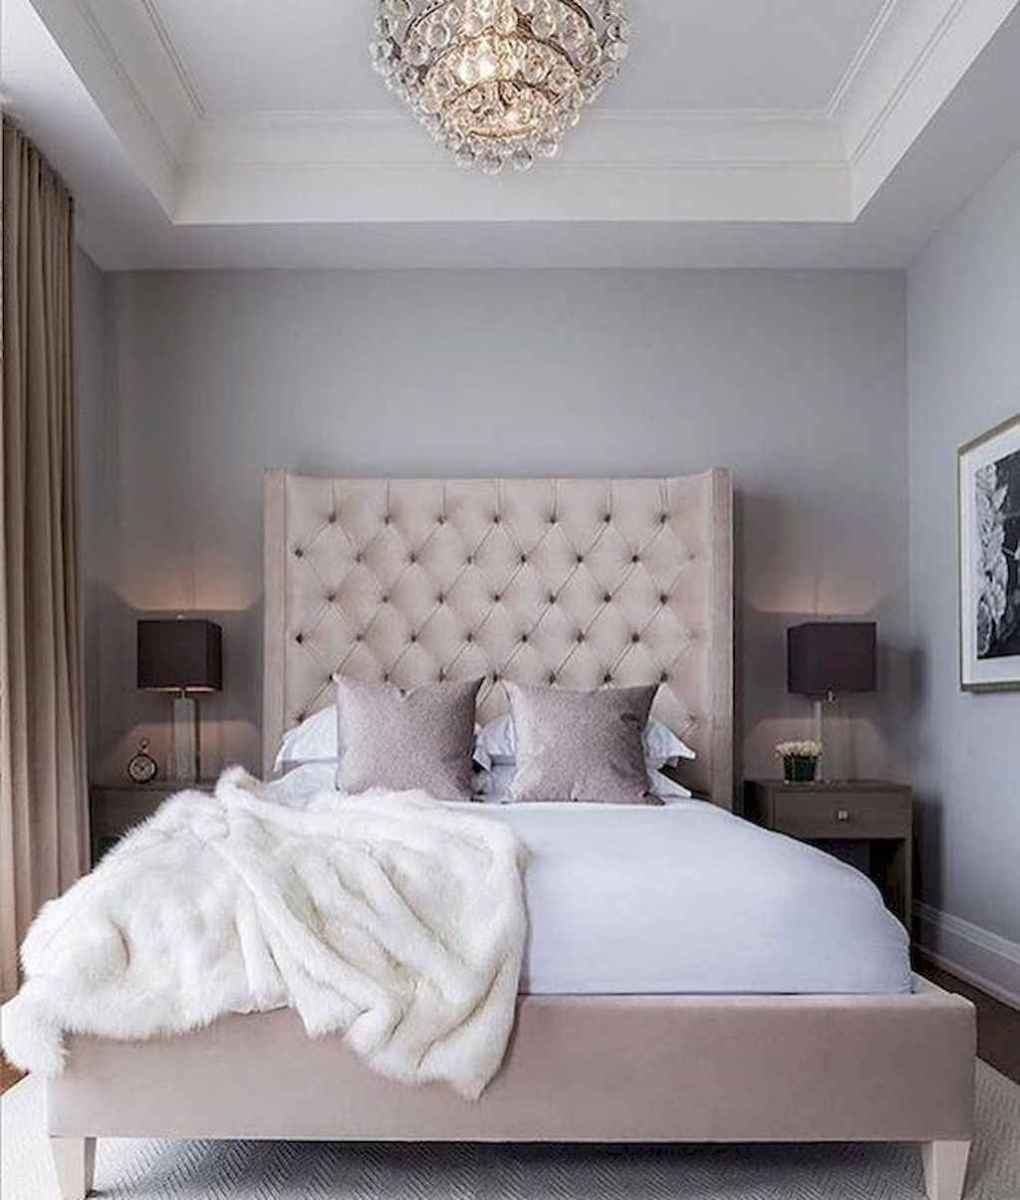 60 simply small master bedroom decor ideas (8)